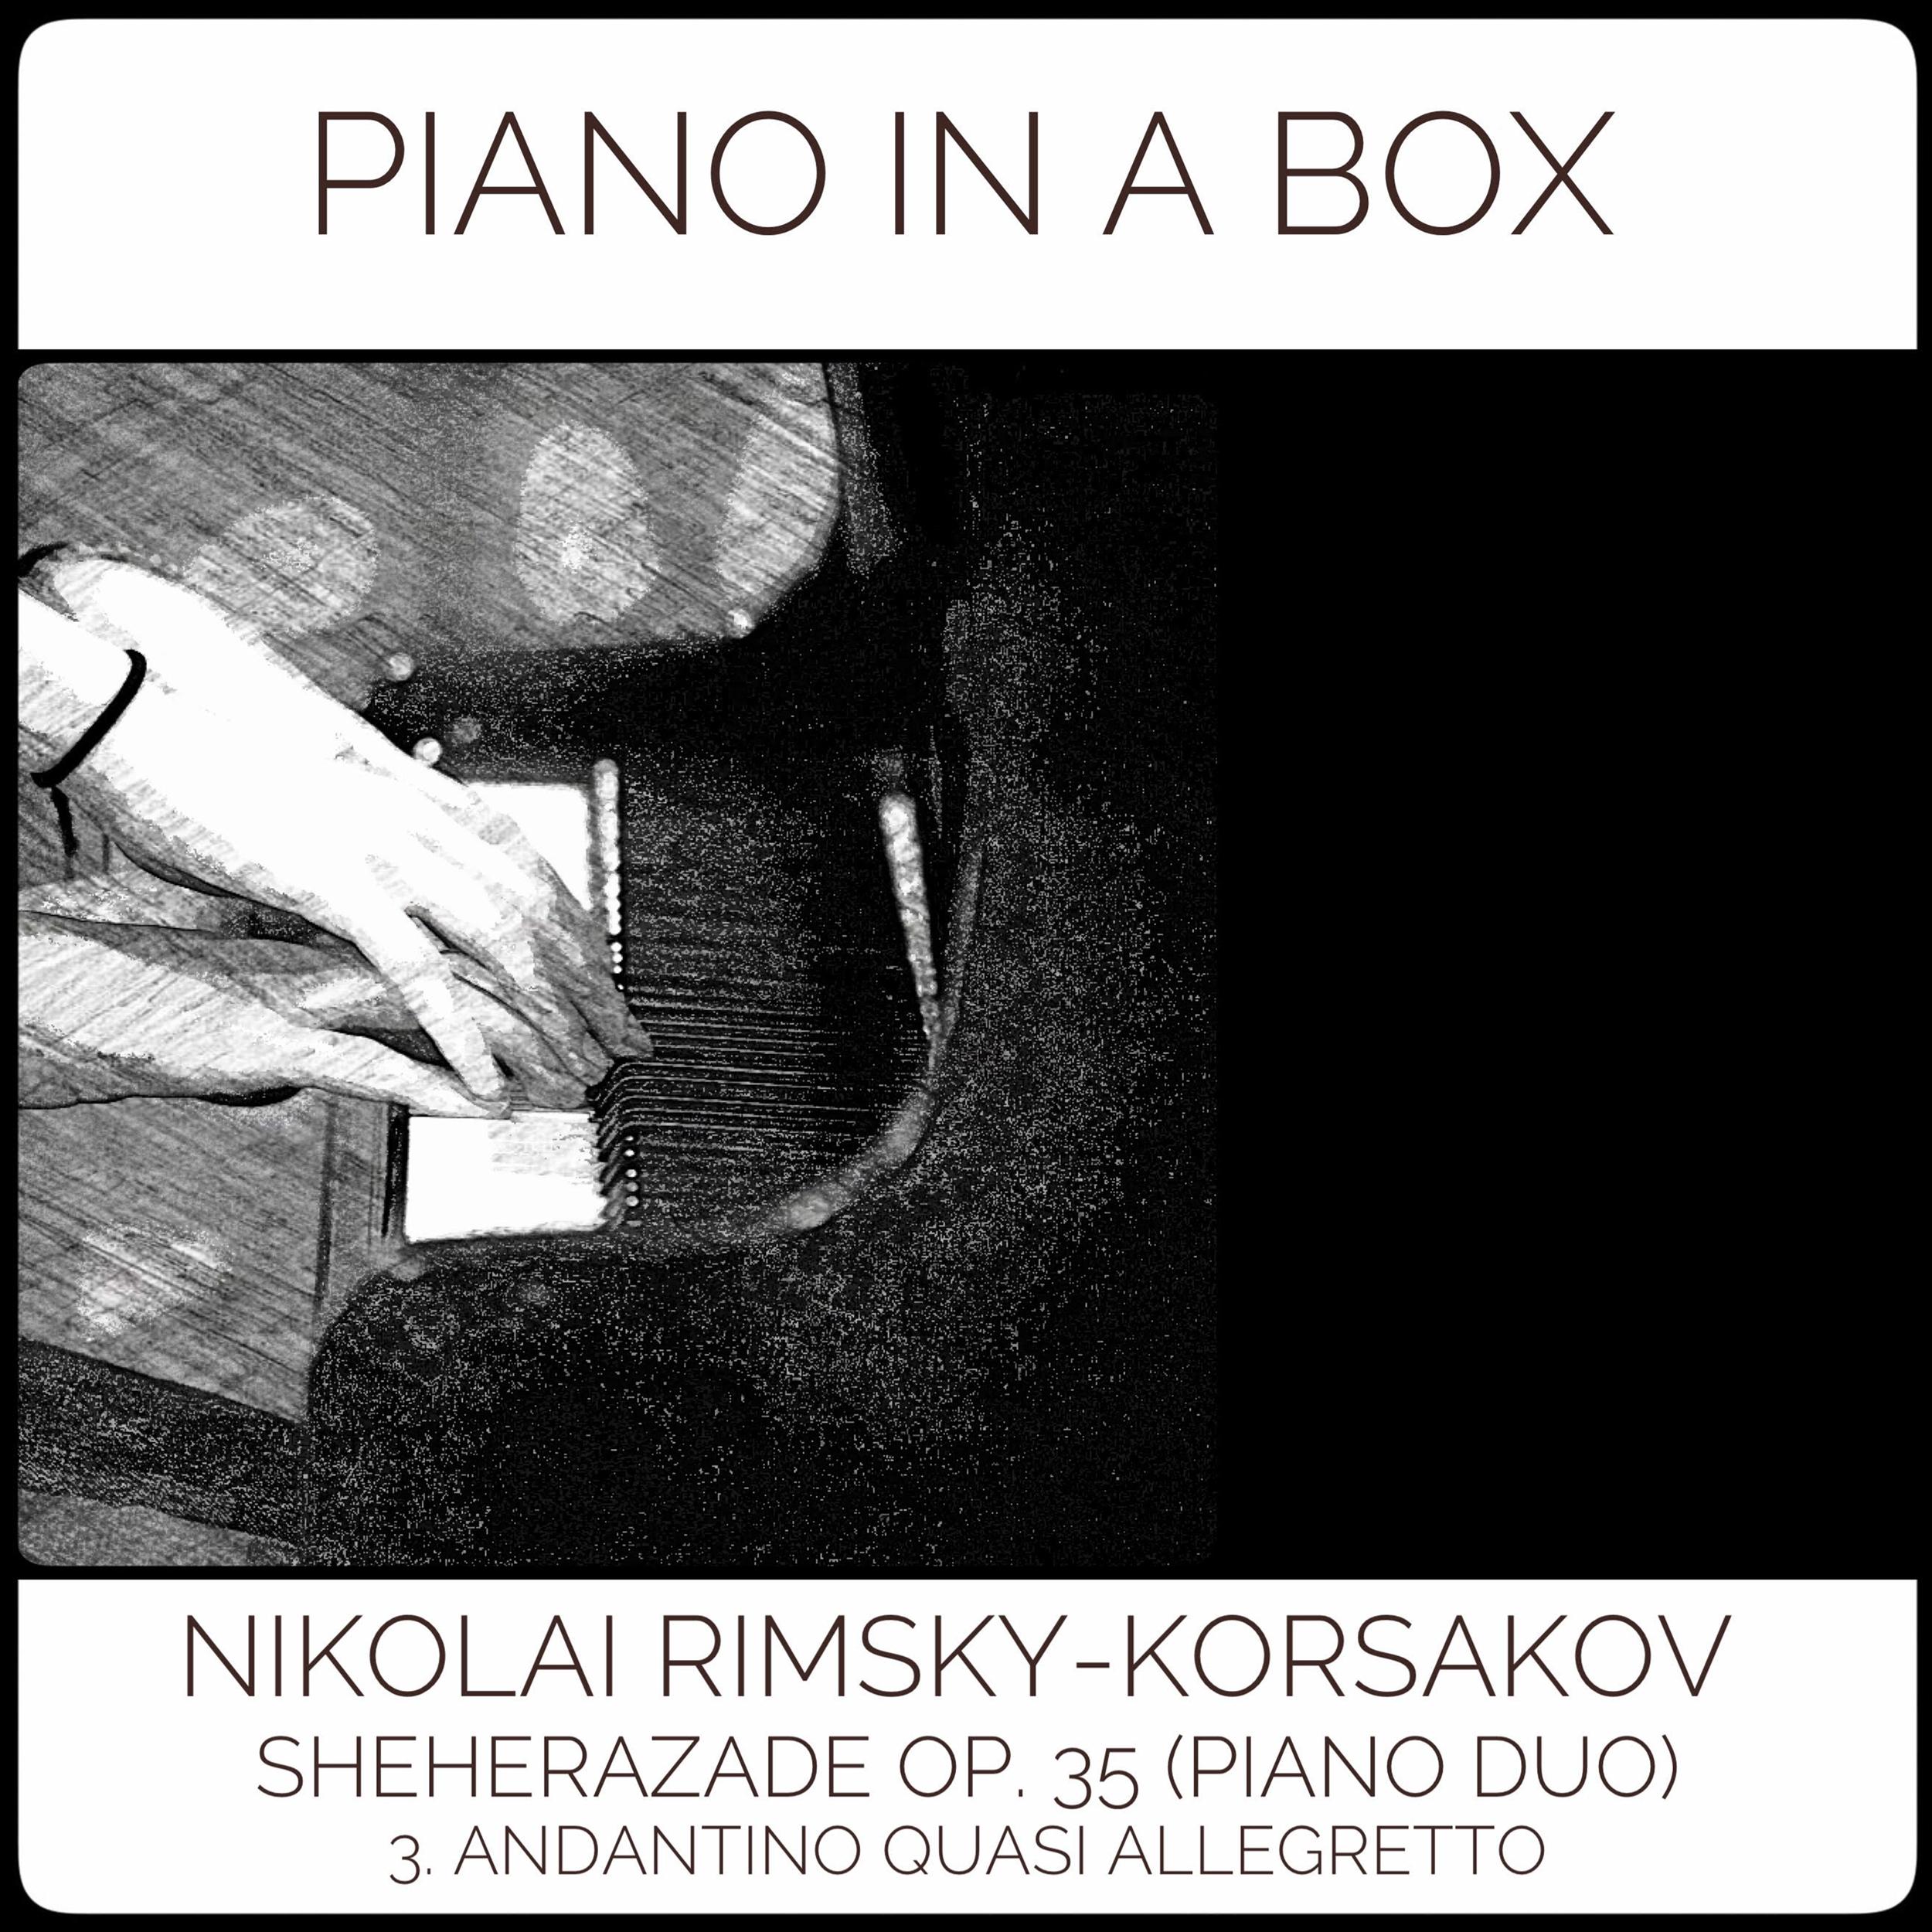 Nikolai-Rimsky-Korsakov---Sheherazade-Op.-35-(Piano-Duo)-3.-Andantino-Quasi-Allegretto